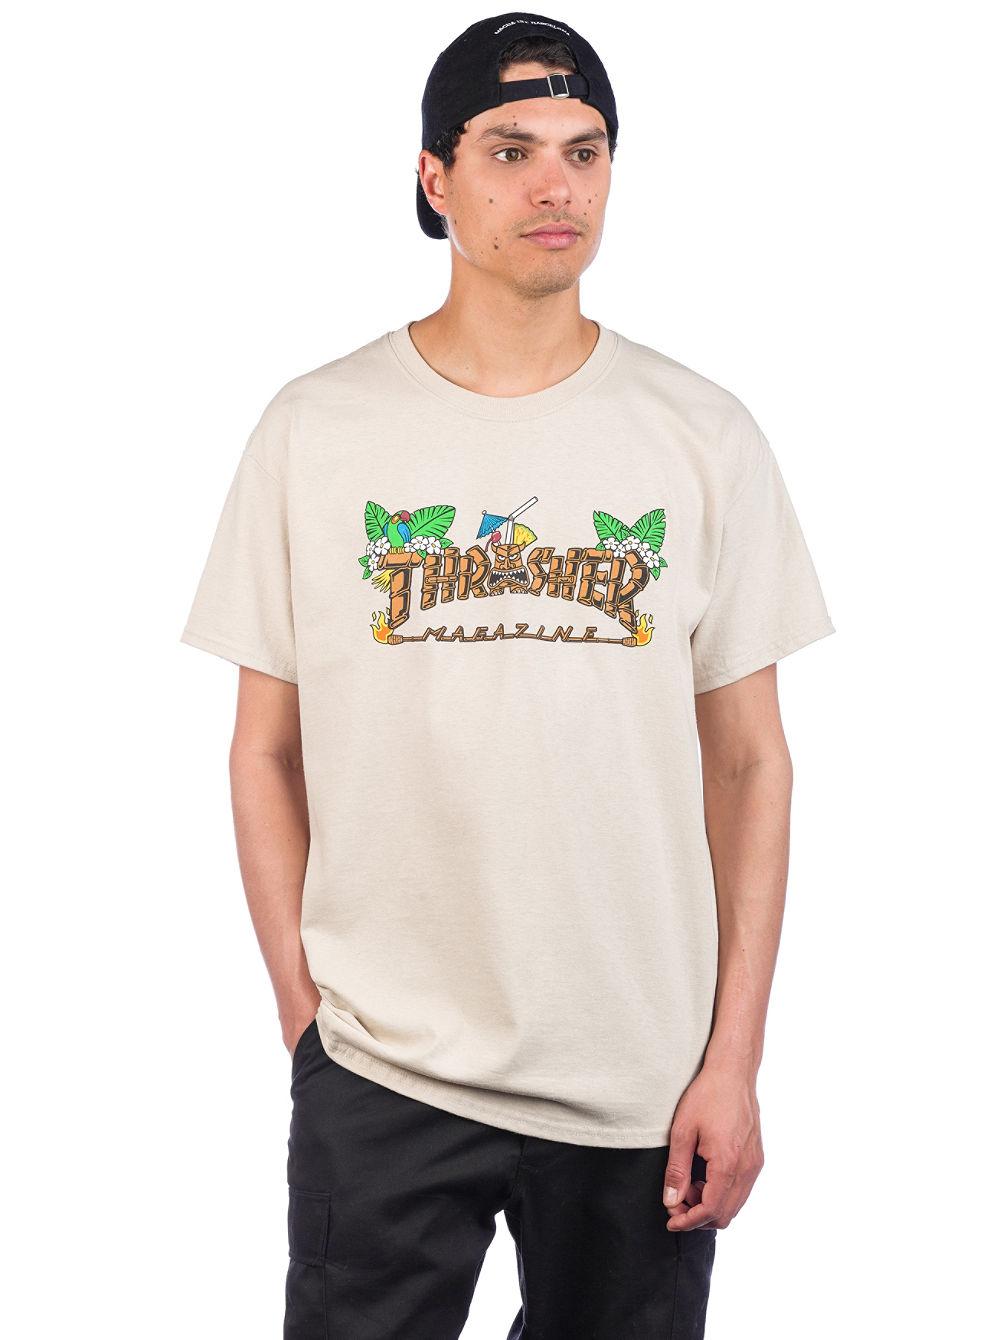 4985cb79f158 Buy Thrasher Tiki T-Shirt T-Shirt online at Blue Tomato